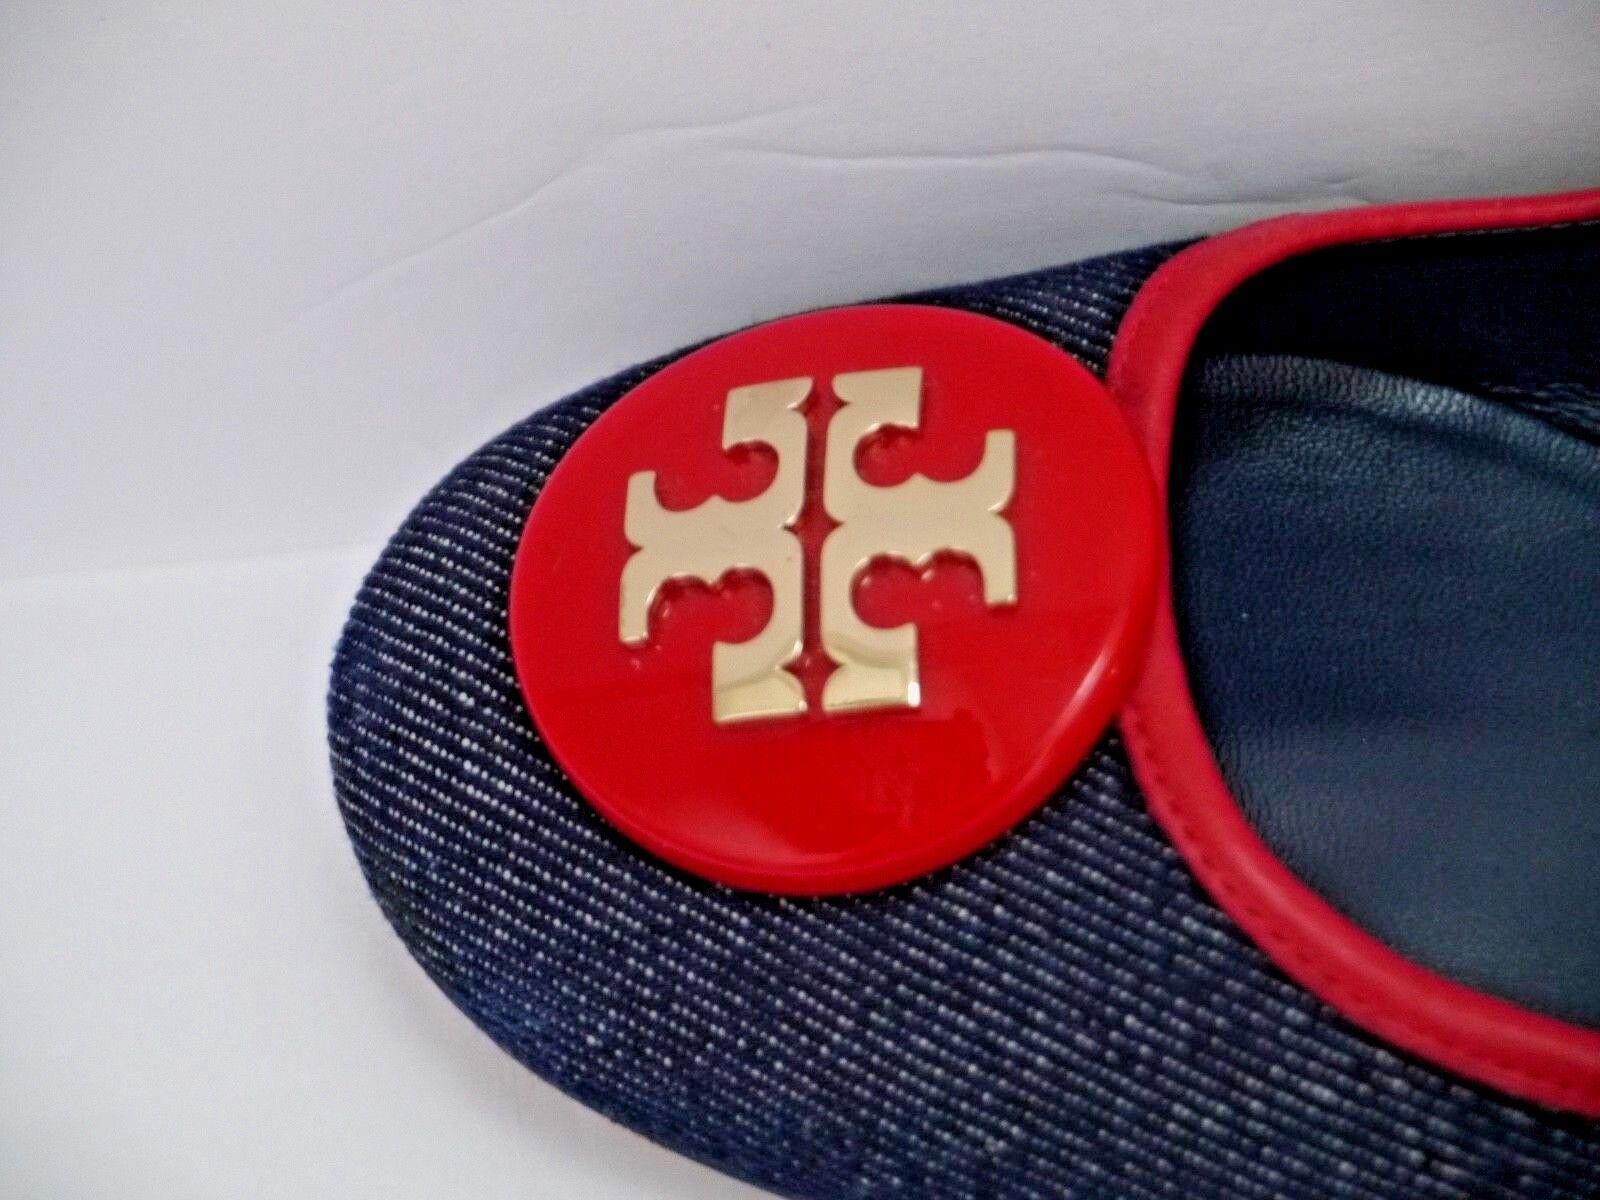 tory burch perry perry burch reva bleu denim Rouge  trim logo détail des ballerines taille 9,5 e232da